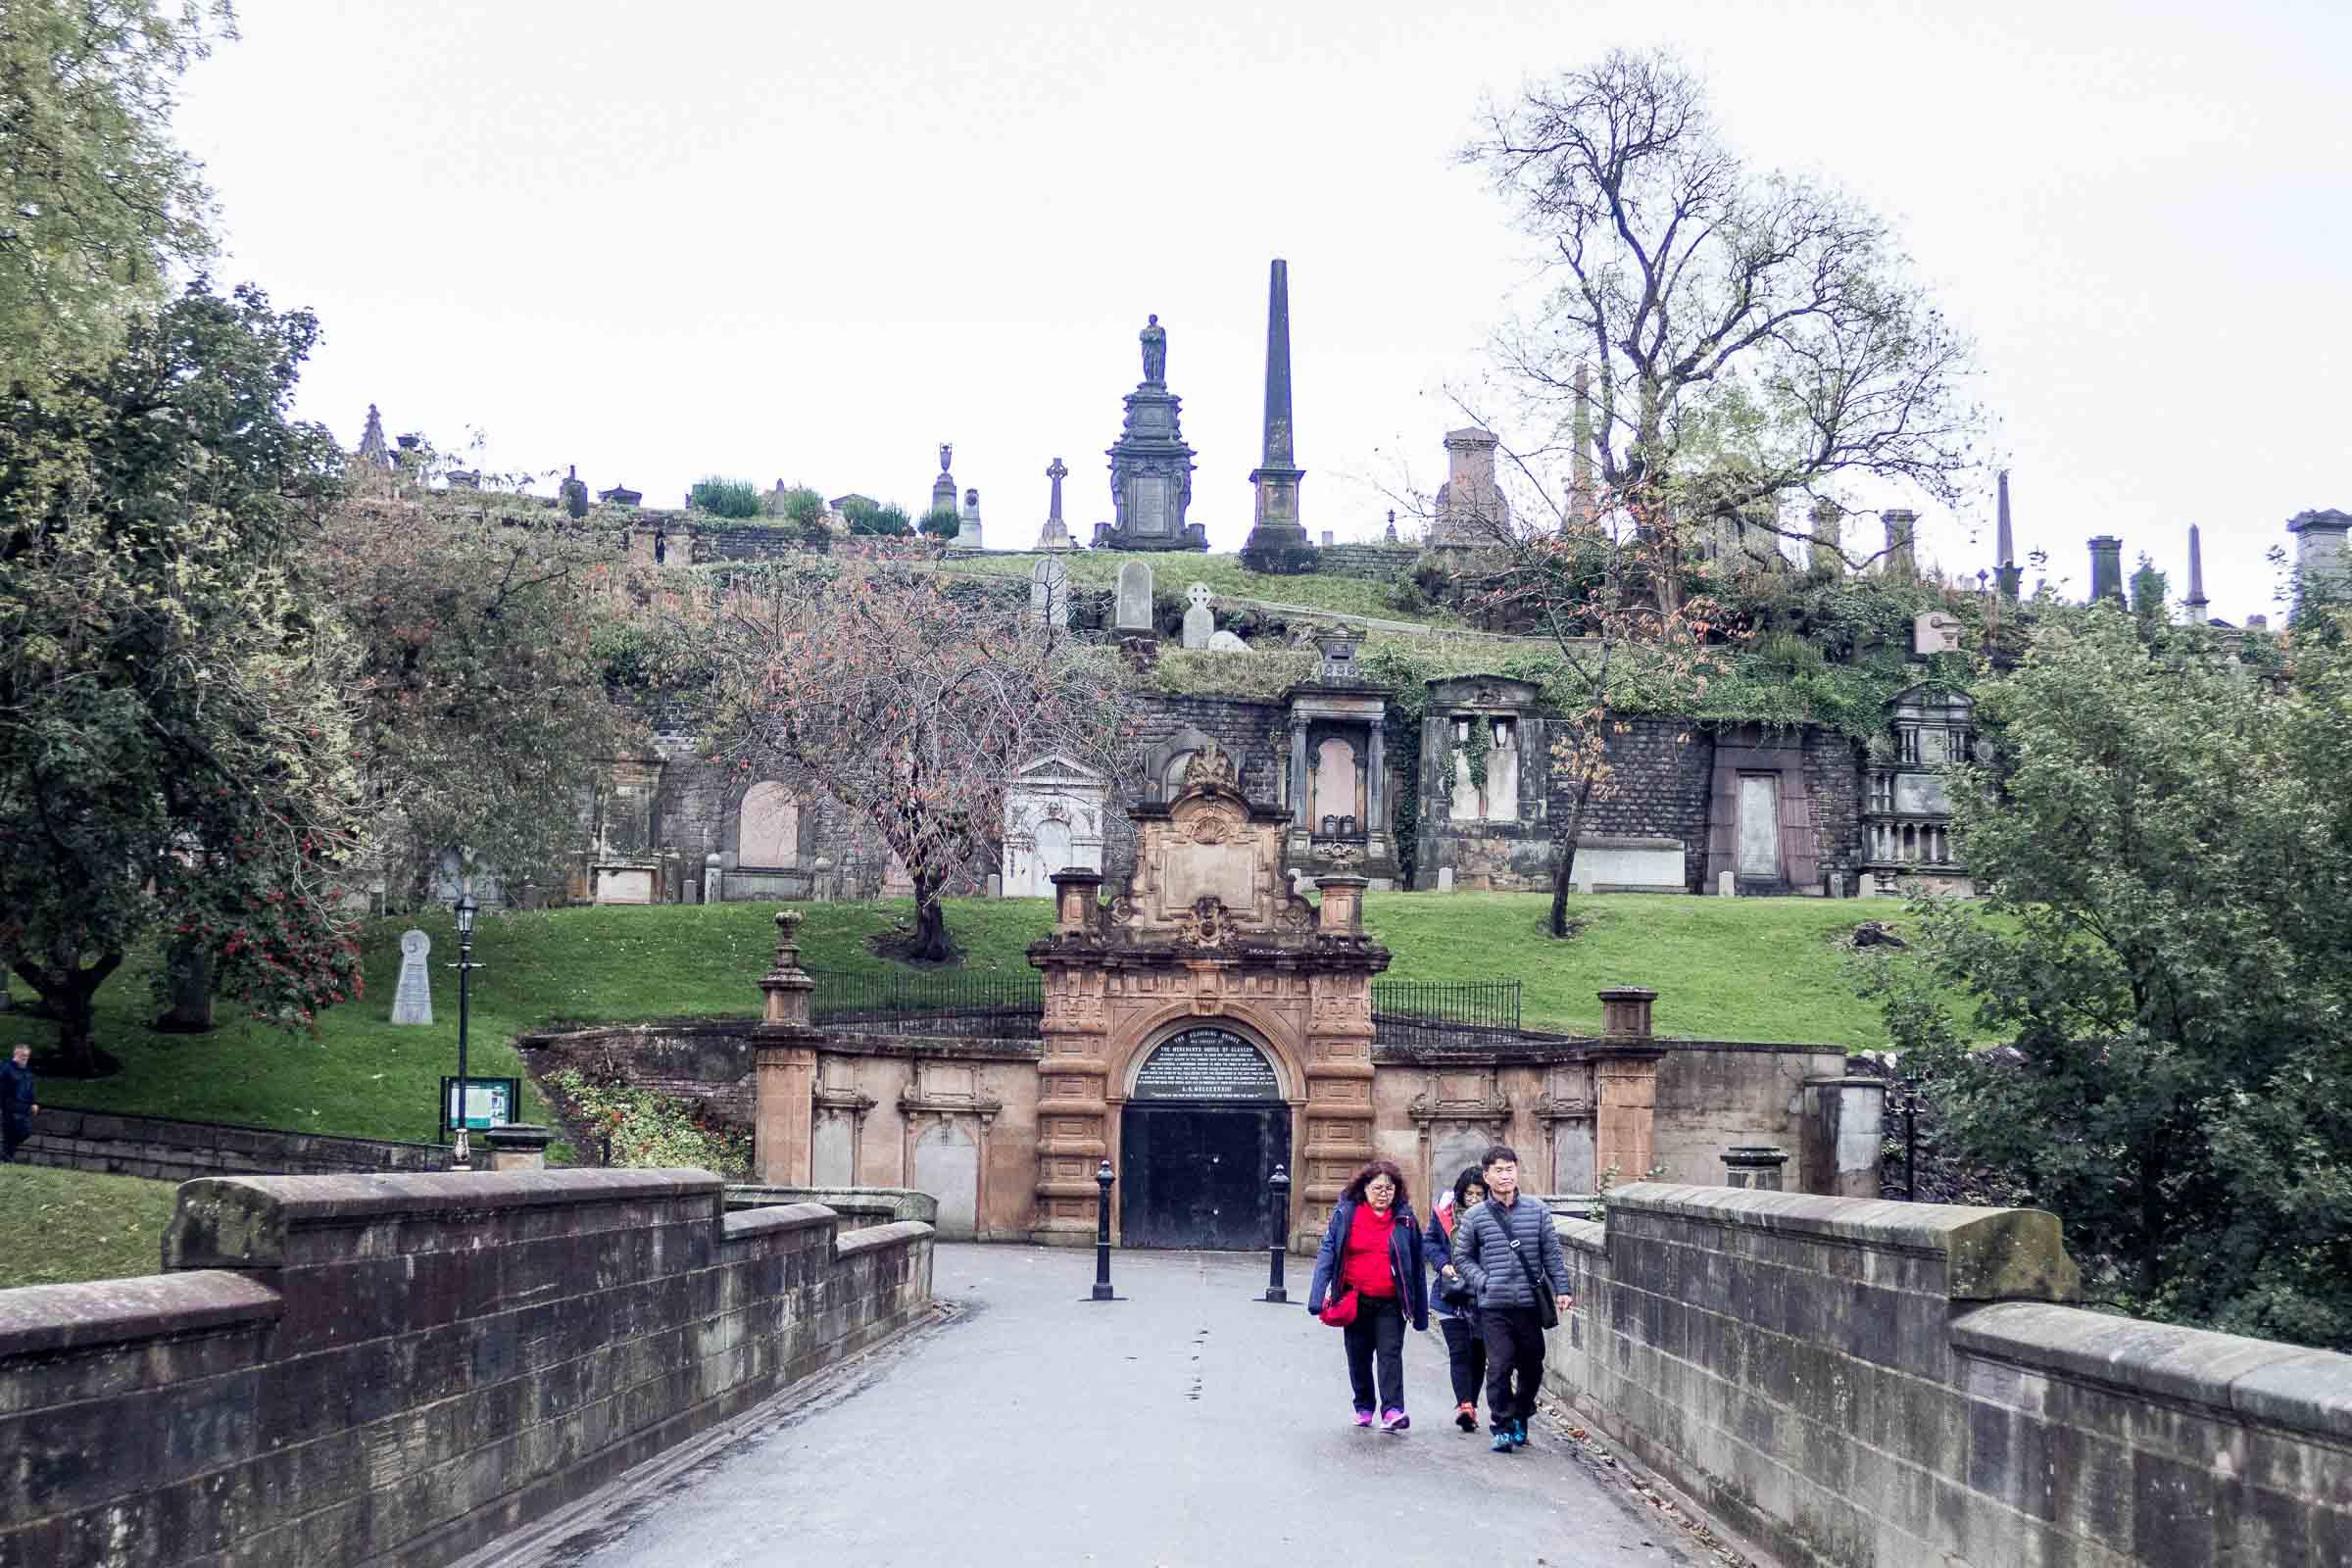 City Guide: Off Duty in Glasgow - necropolis